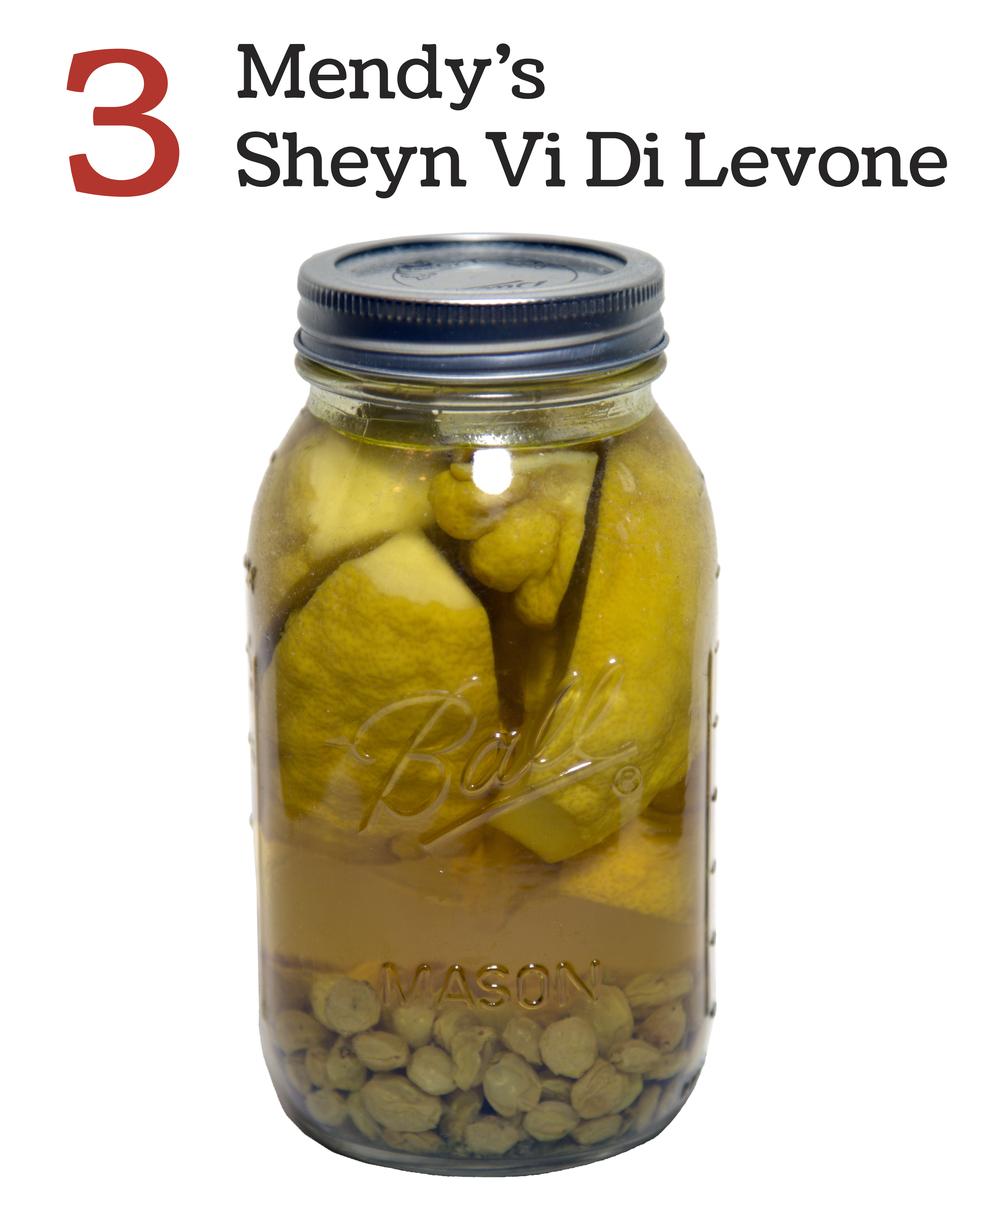 3    Mendy's Sheyn Vi Di Levone